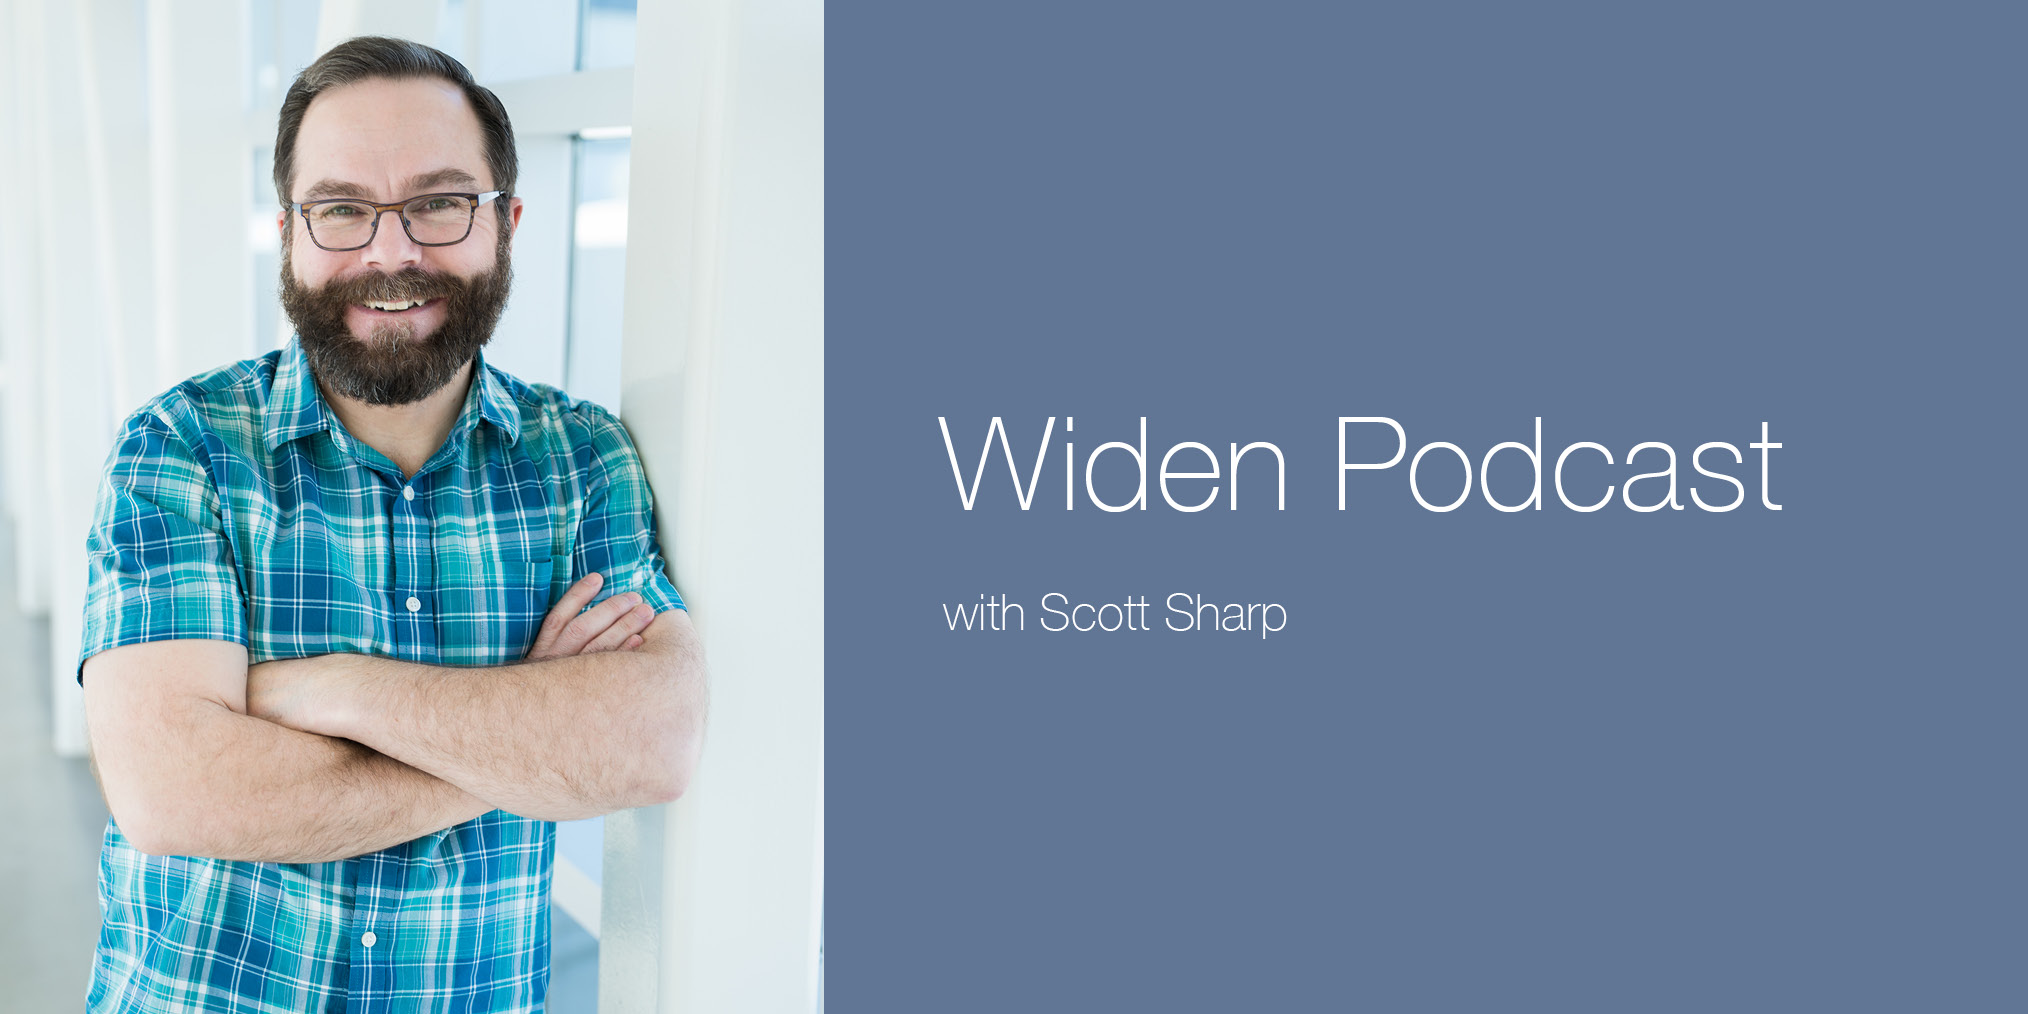 Scott Sharp Widen Podcast